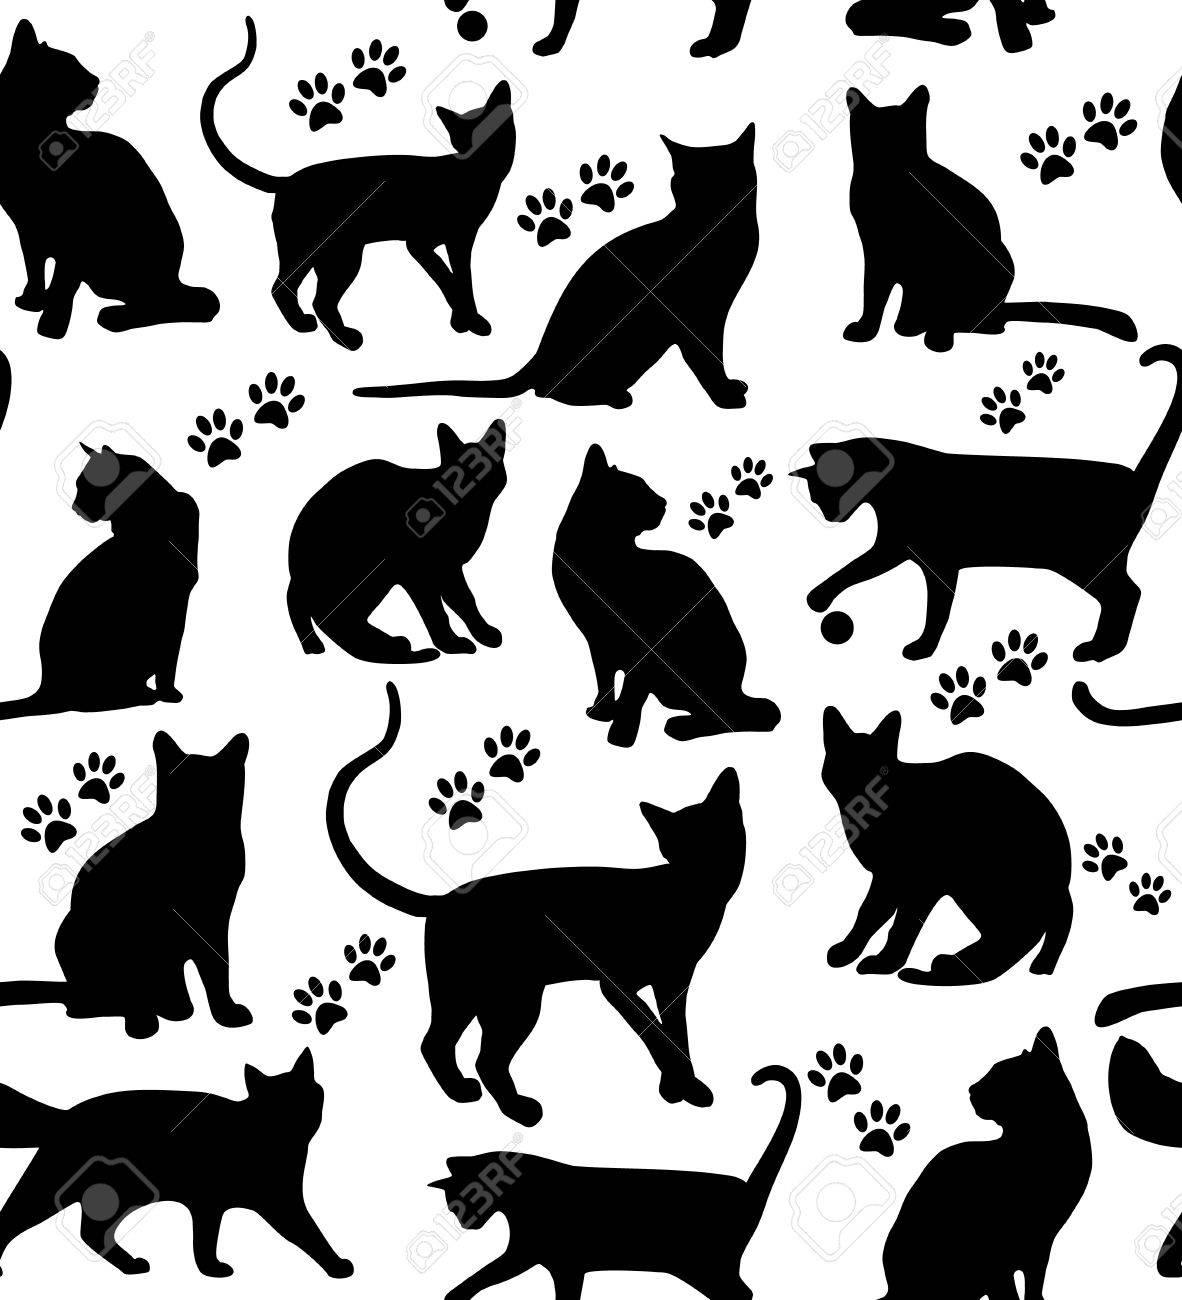 Seamless pattern of animals. Cats pattern on white. Foto de archivo - 38966857